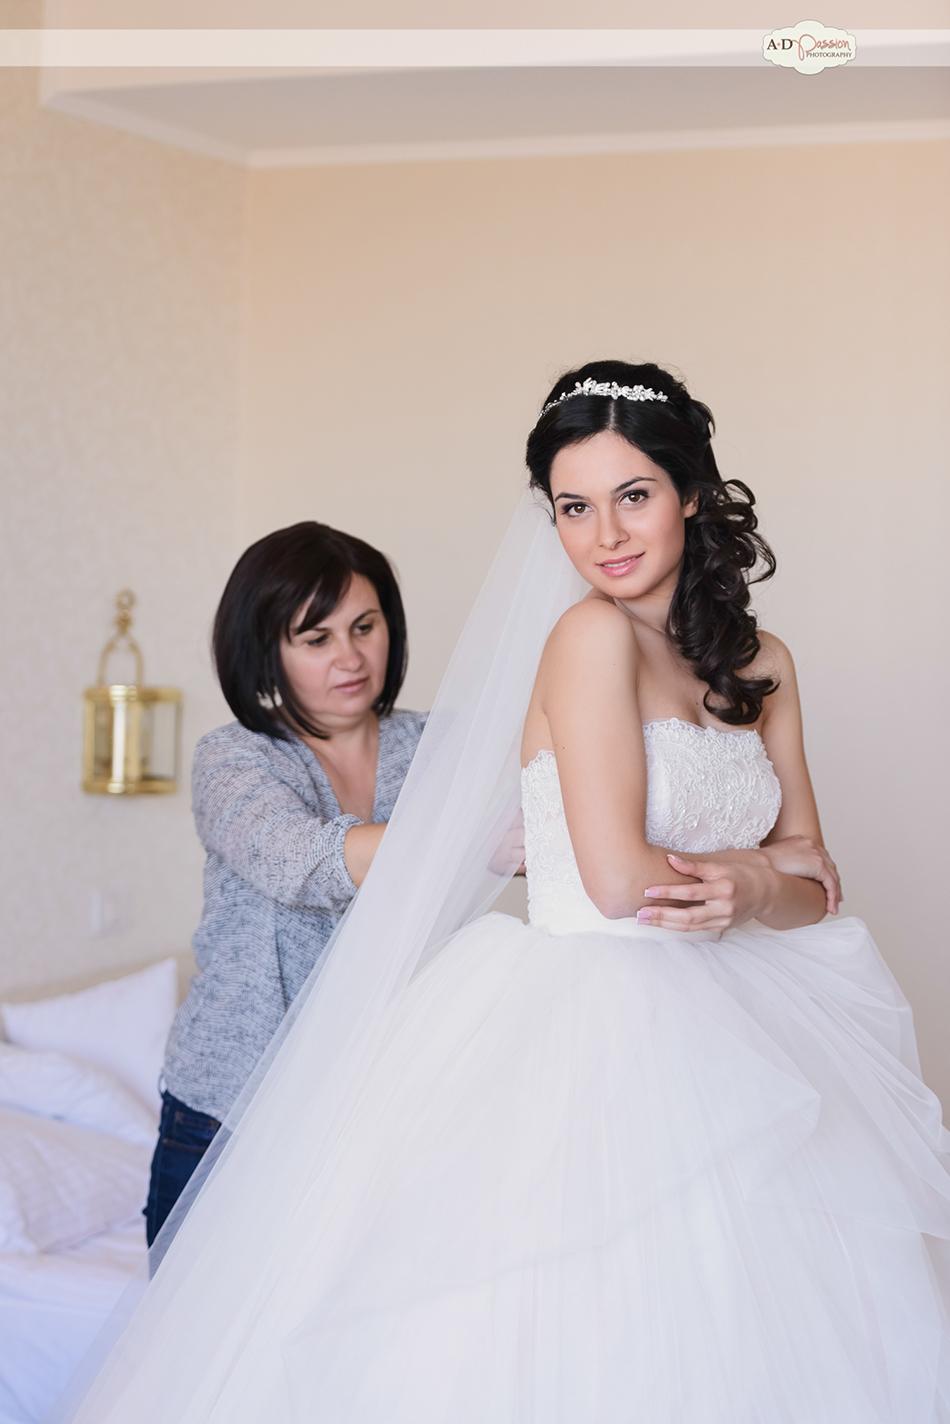 AD Passion Photography | fotograf-profesionist-de-nunta-arad-timisoara-bucuresti_madalina+mihnea_0021 | Adelin, Dida, fotograf profesionist, fotograf de nunta, fotografie de nunta, fotograf Timisoara, fotograf Craiova, fotograf Bucuresti, fotograf Arad, nunta Timisoara, nunta Arad, nunta Bucuresti, nunta Craiova